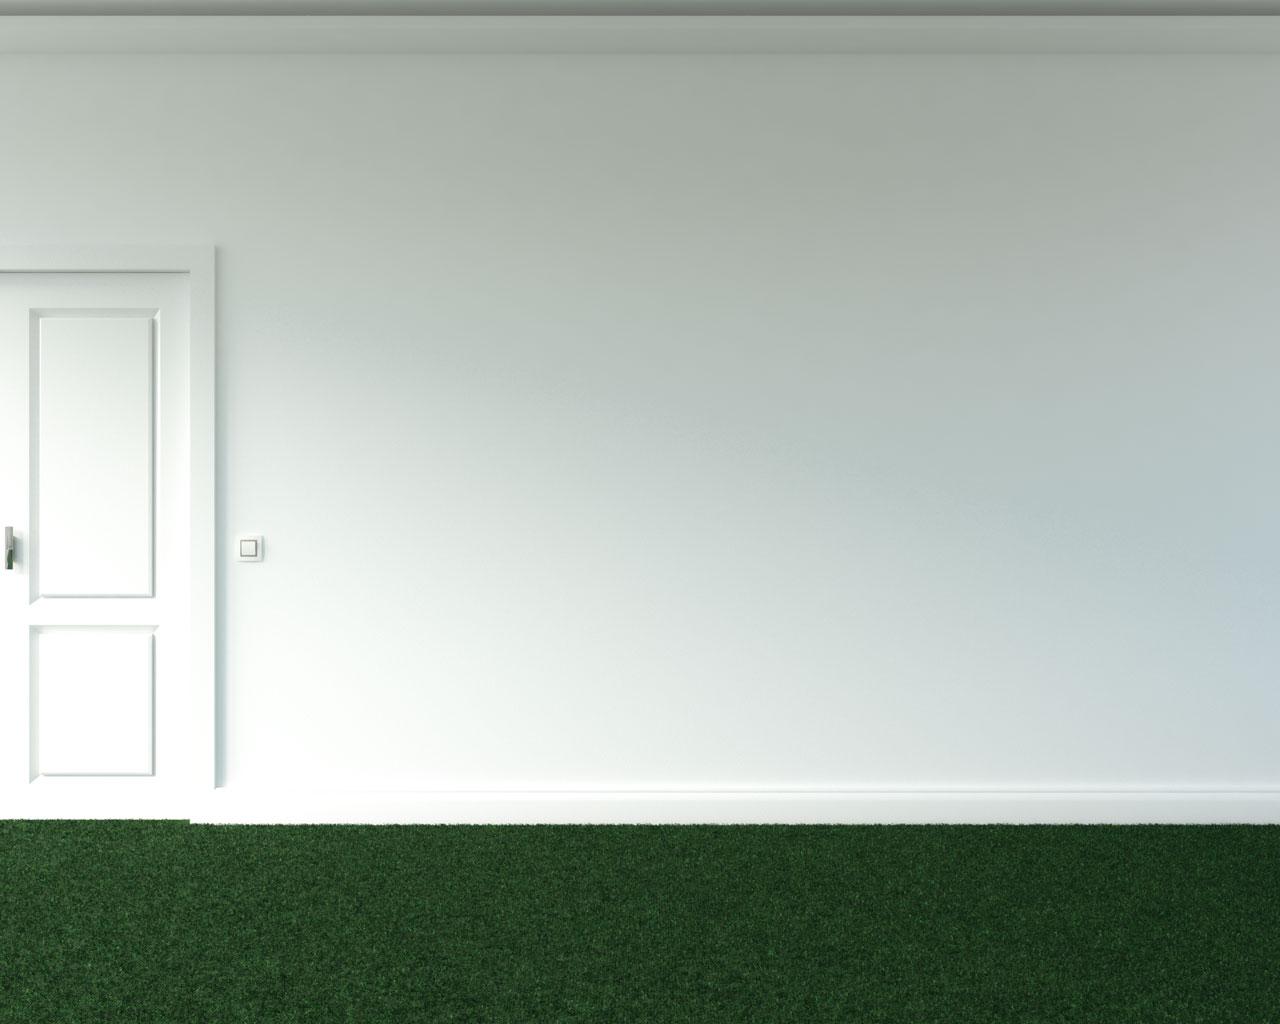 Plain white wall with green carpet floors